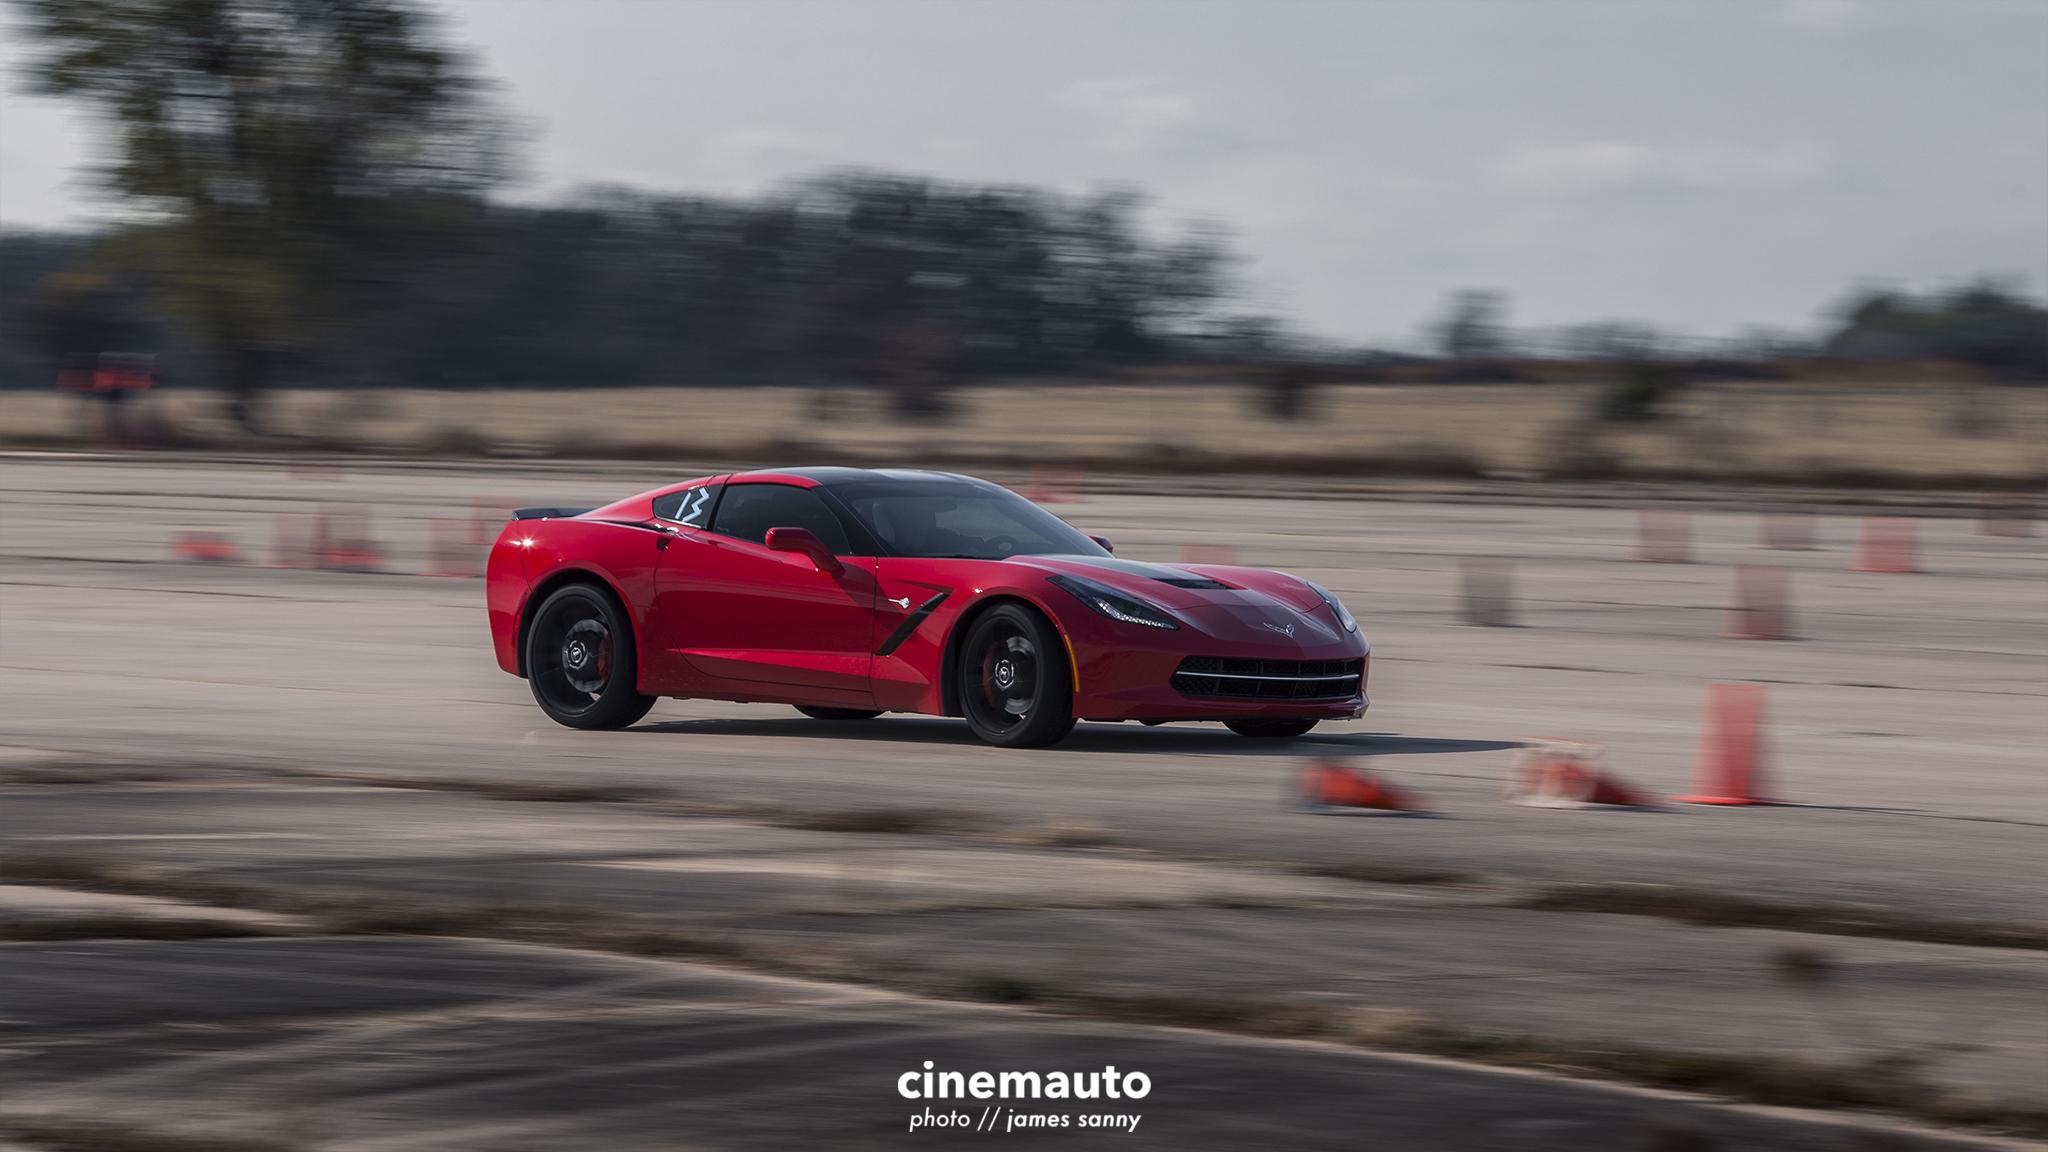 wichita-automotive-photographer-james-sanny-scca10.jpg